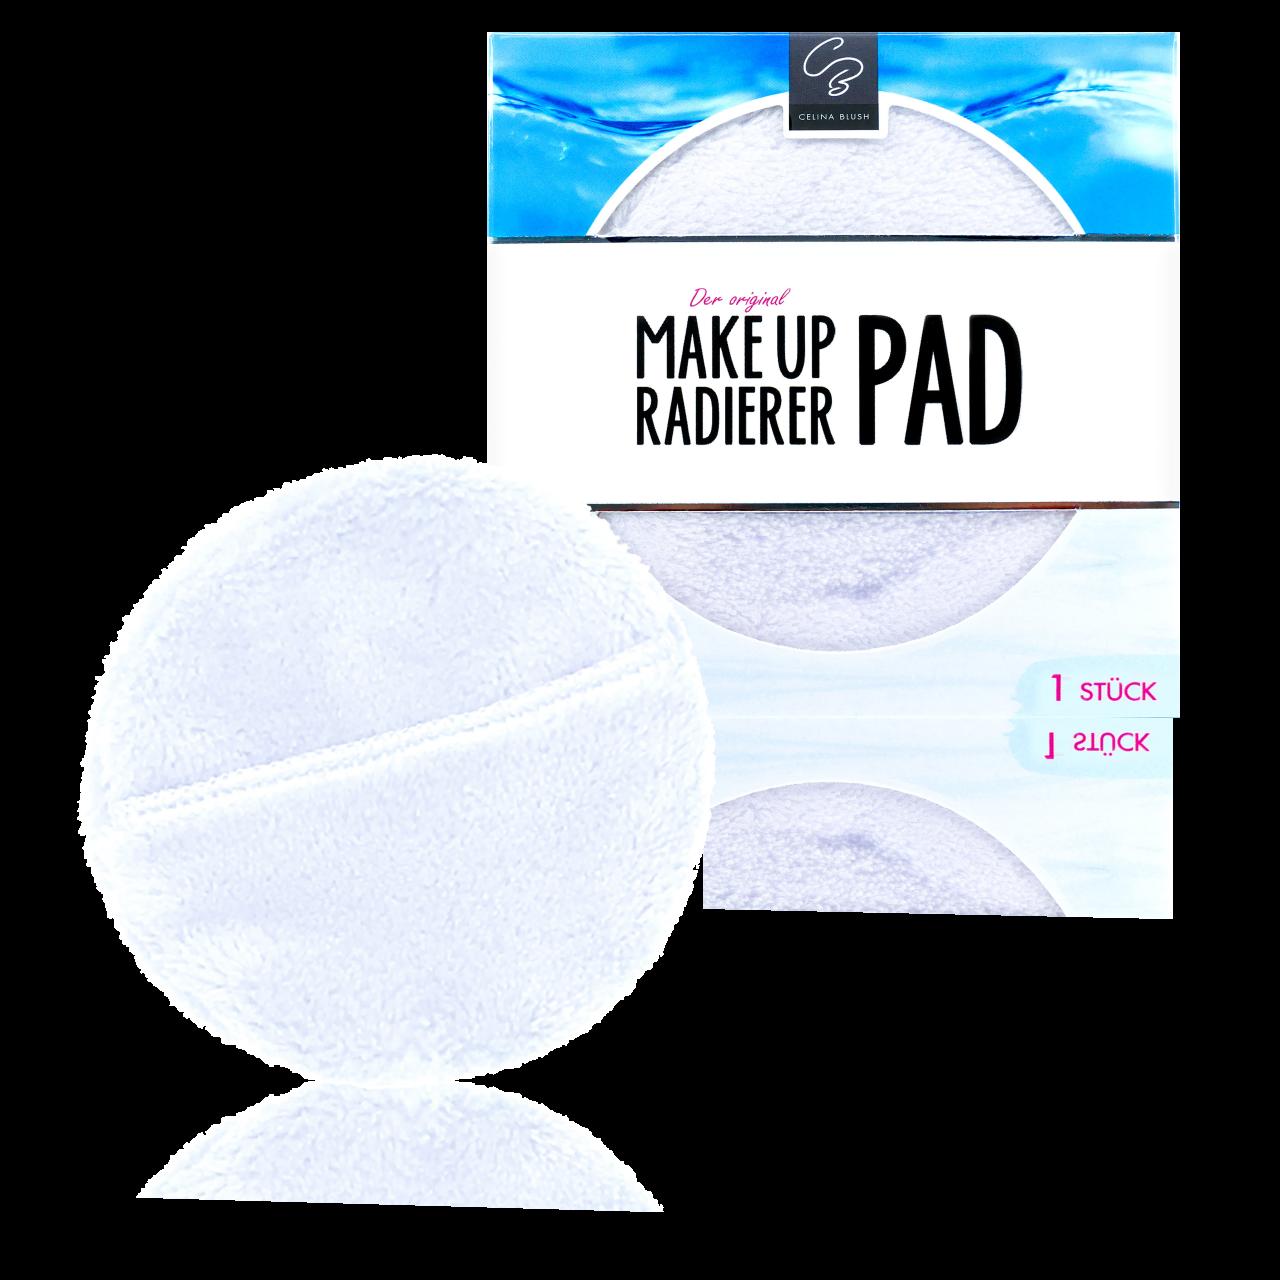 MakeUp Radierer Pads weiß Durchmesser 9cm, 5 Stück